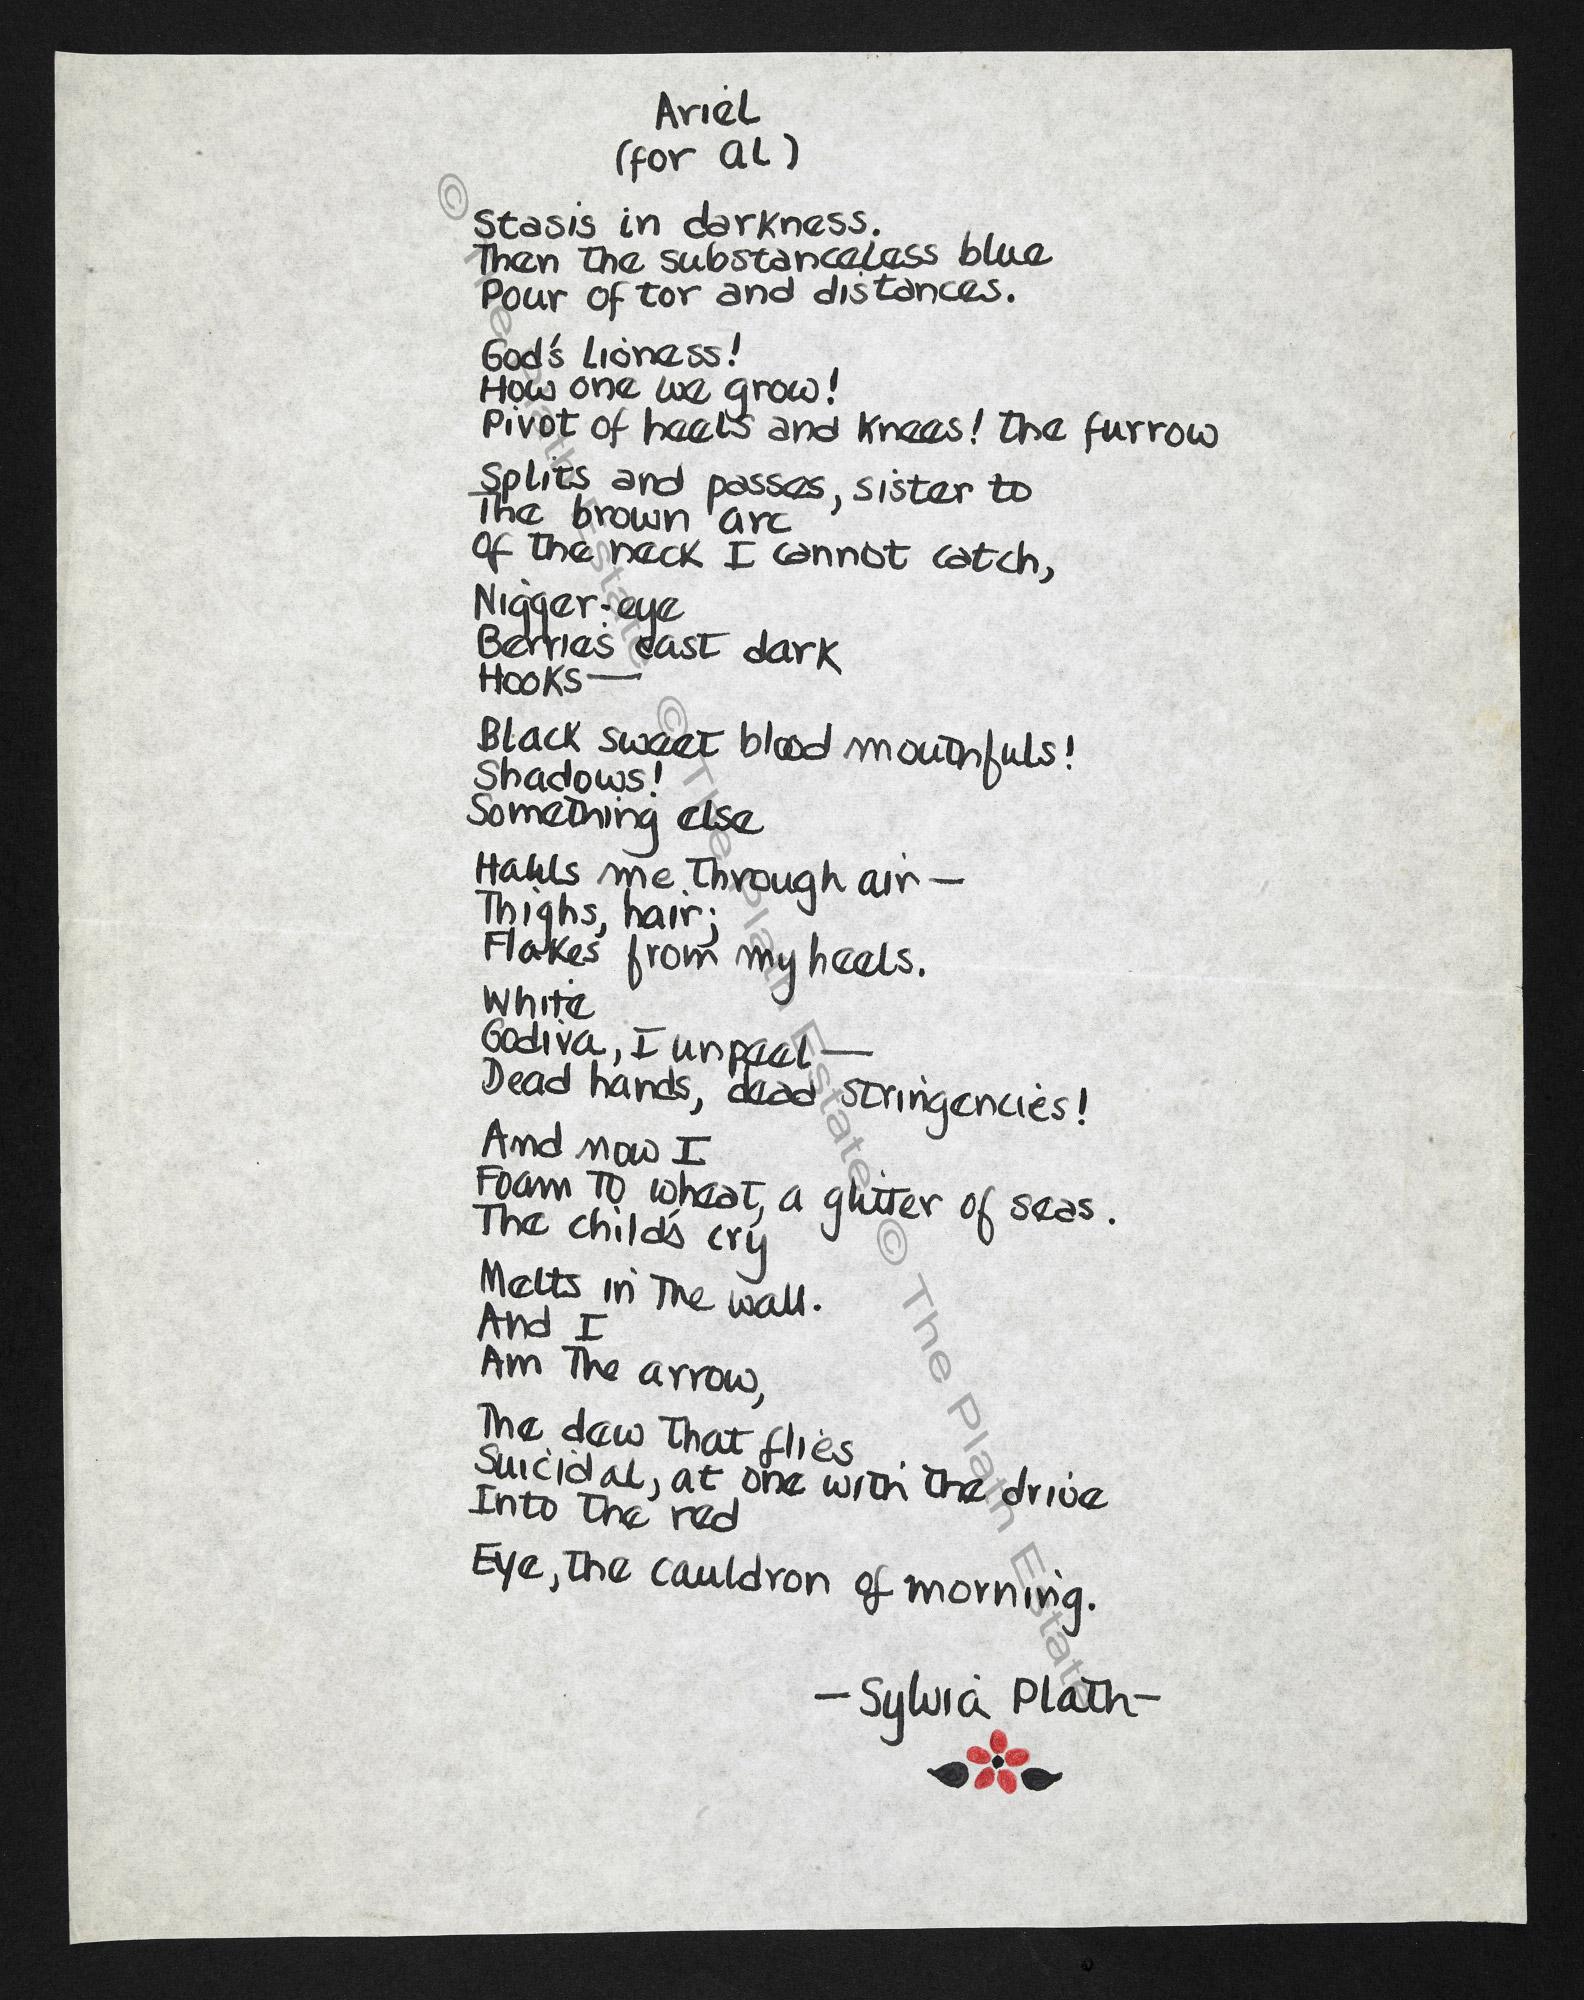 Sylvia Plath's 'Ariel', dedicated to Al Alvarez